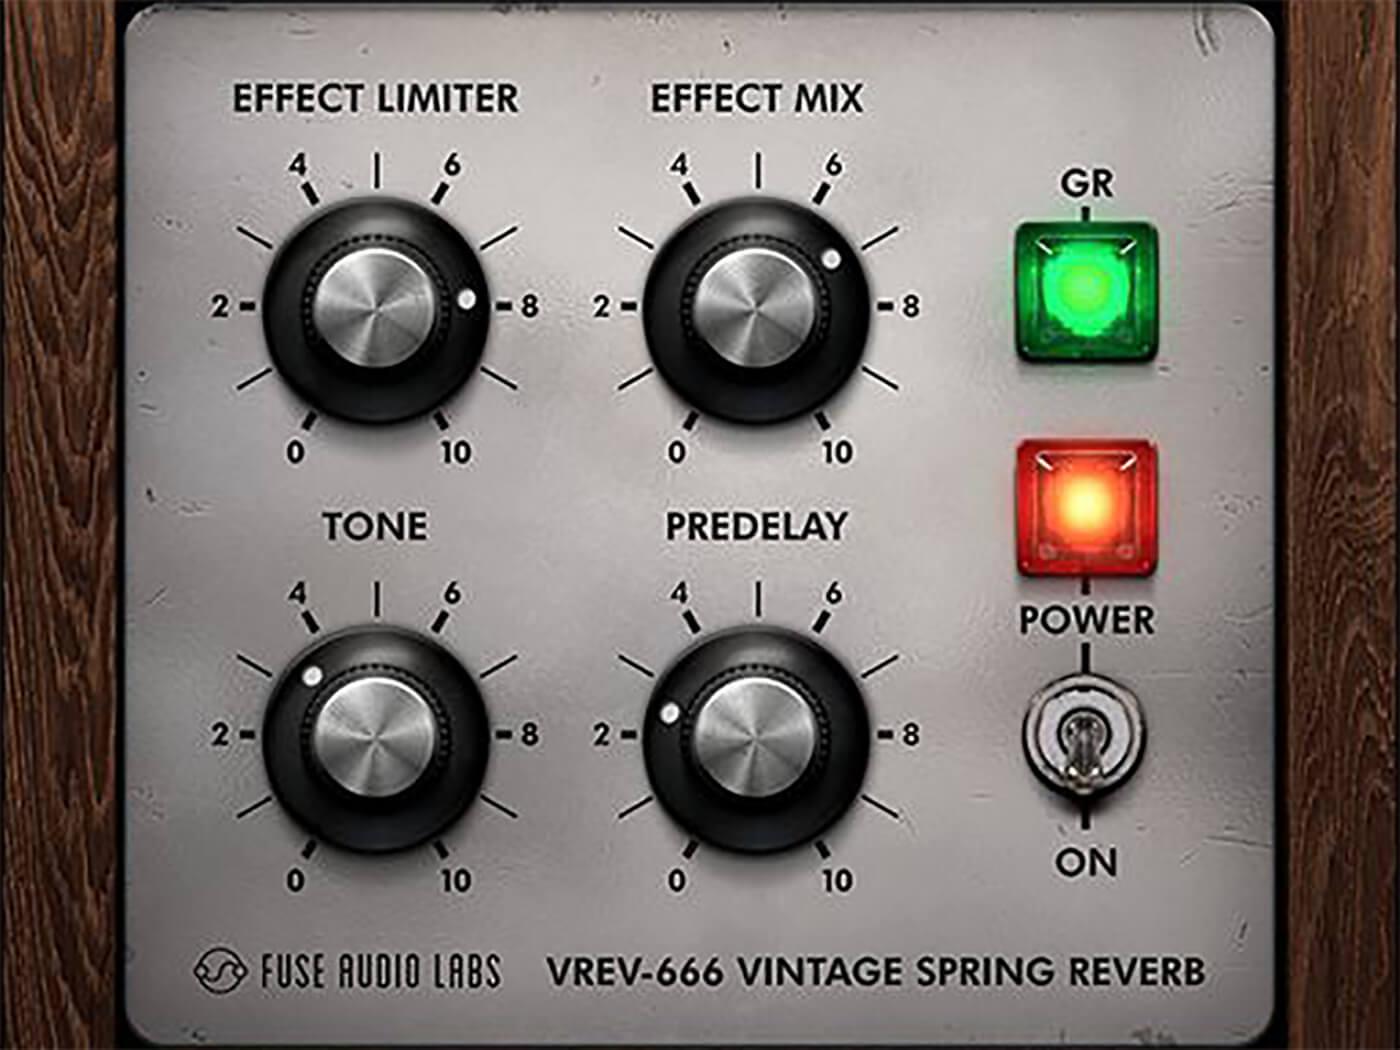 Fuse Audio Labs - VREV-666